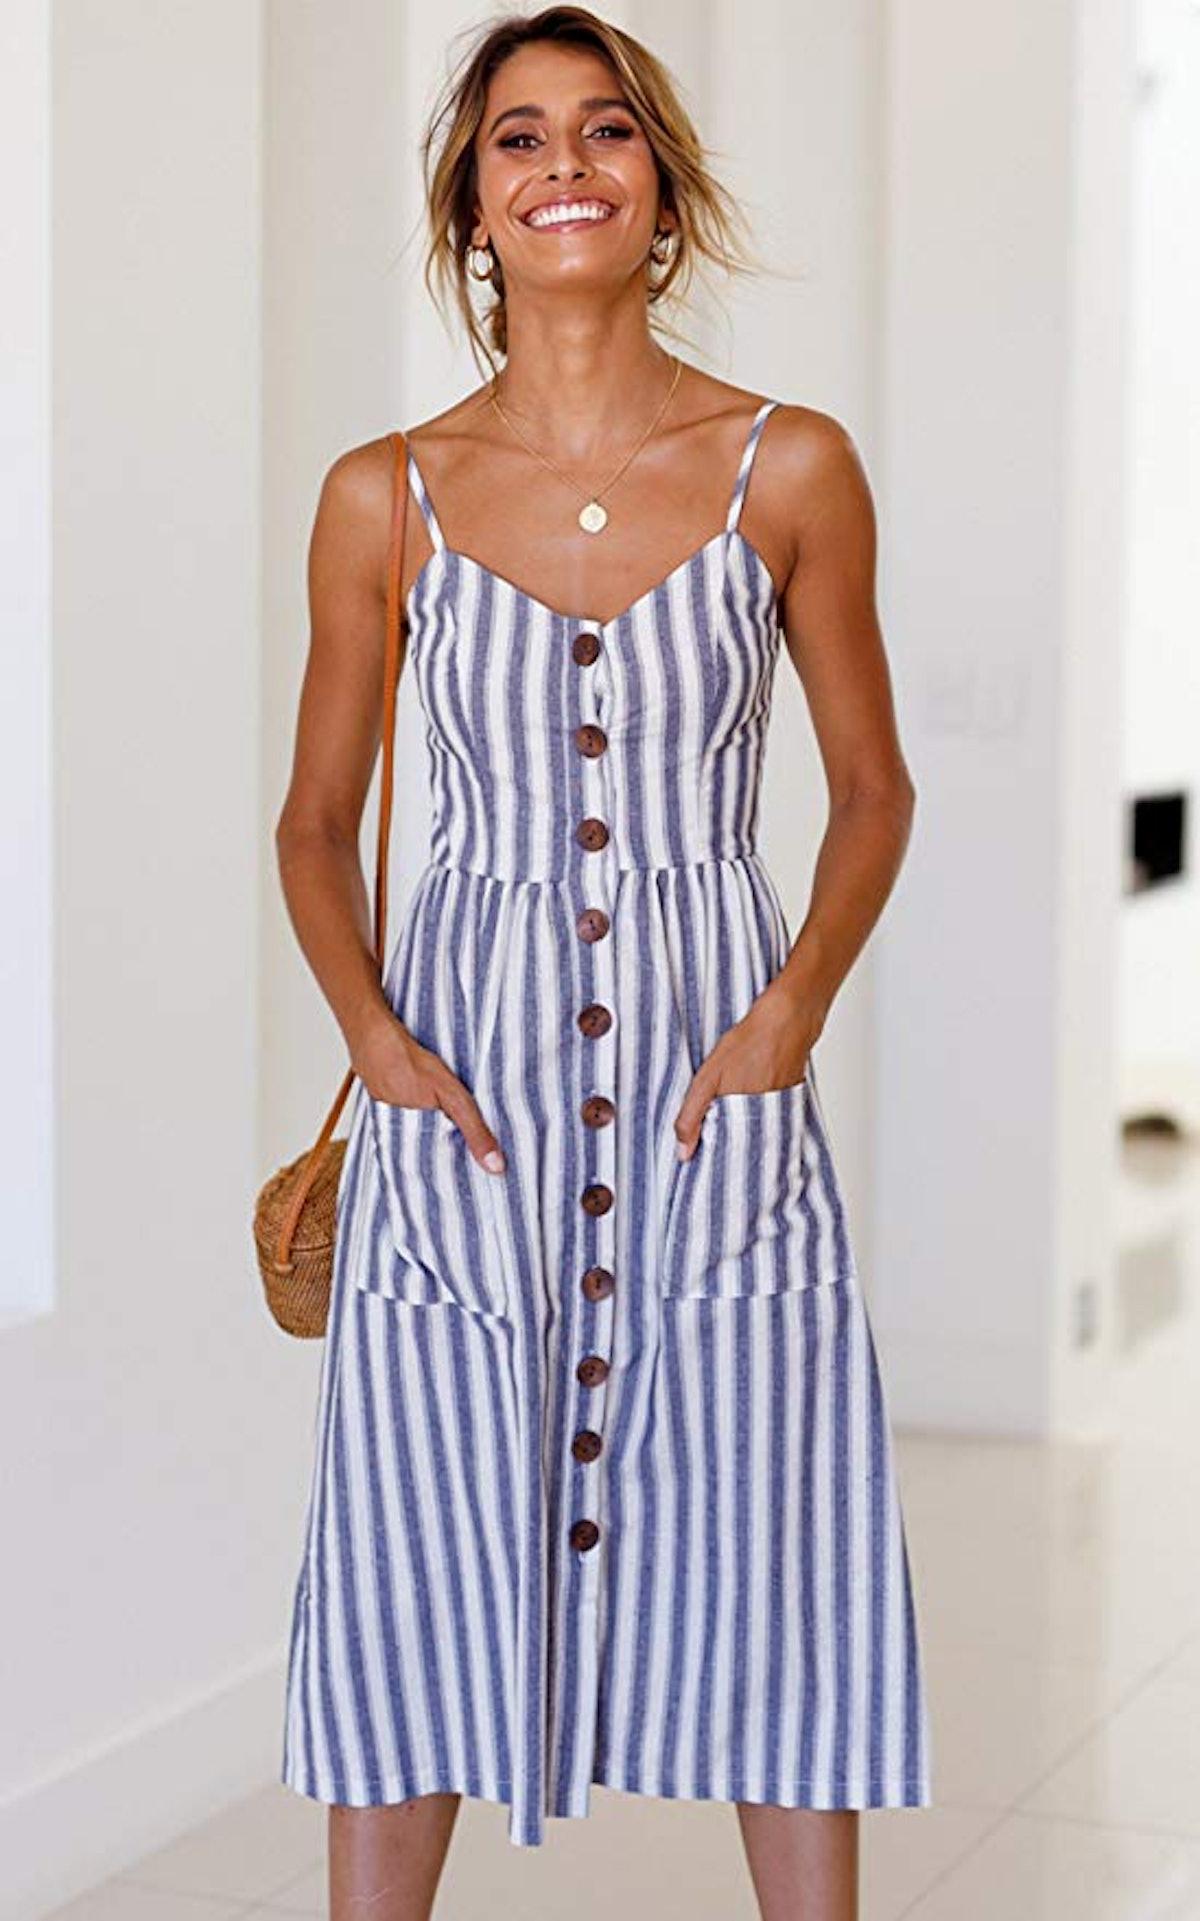 Angashion Women's Midi Dress with Pockets